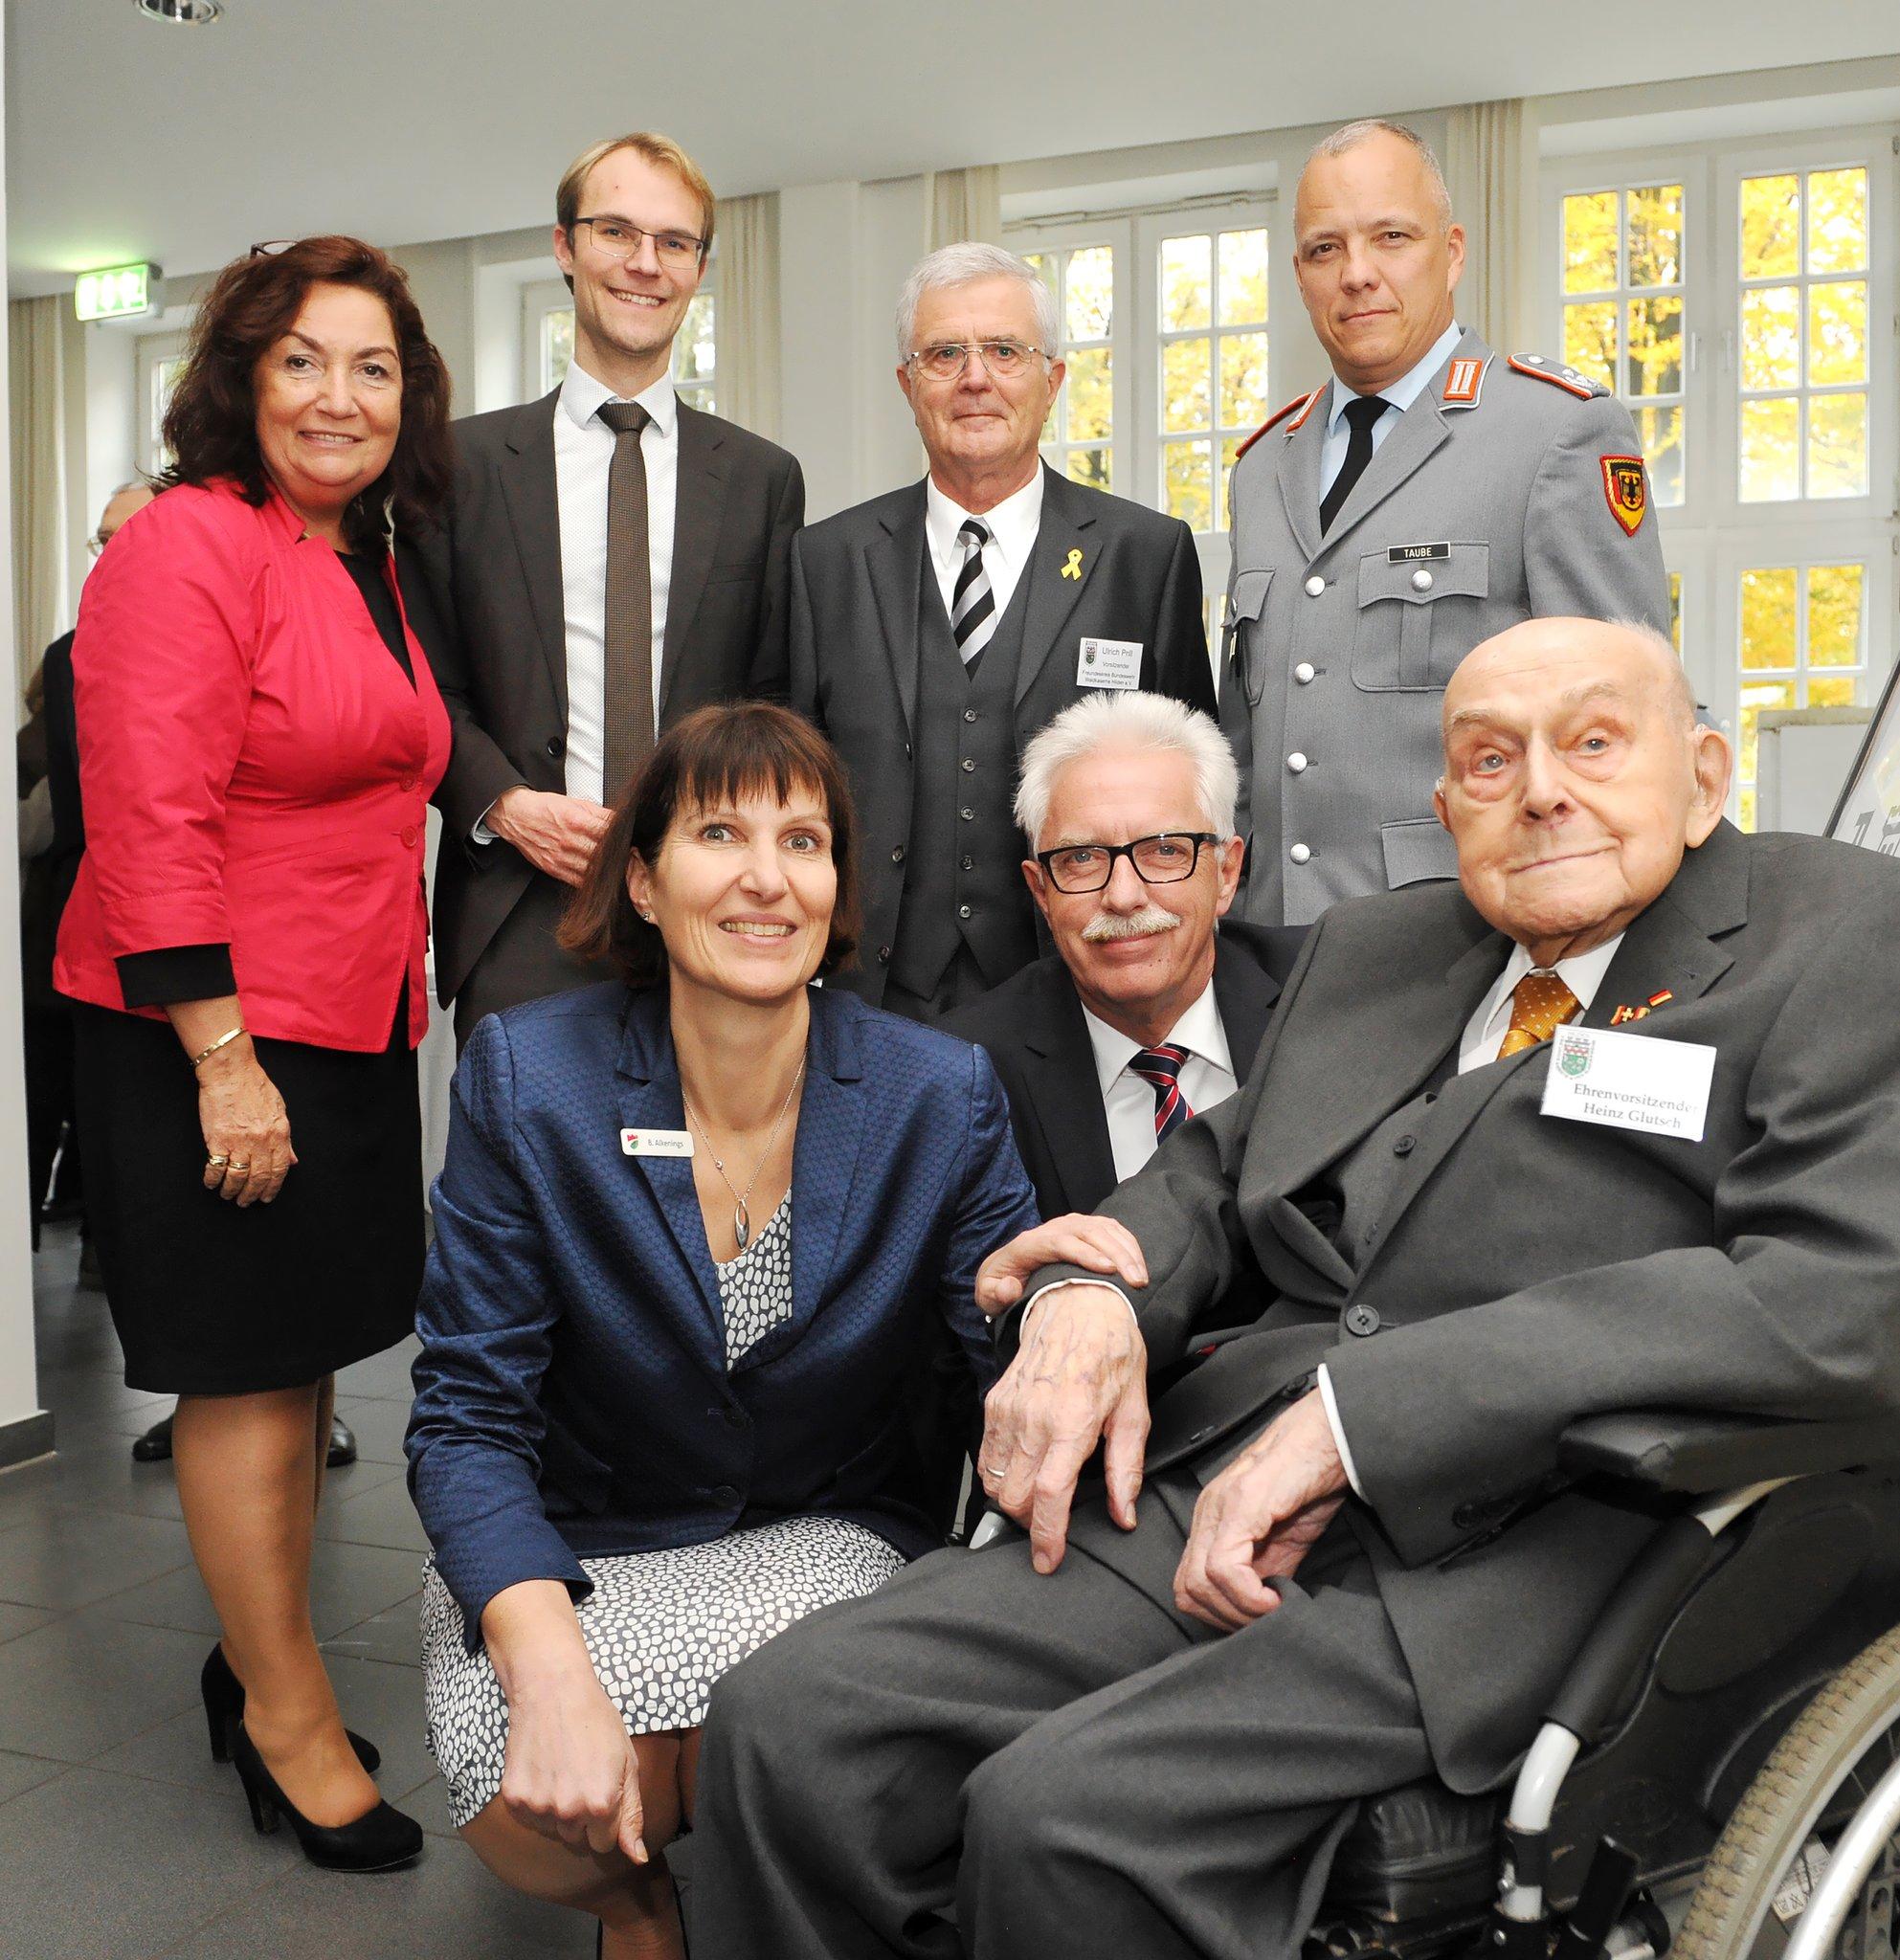 Oberstleutnant a.D. Heinz Glutsch Hildens erster Standortältester: 100. Geburtstag gewürdigt - Lokalkompass.de